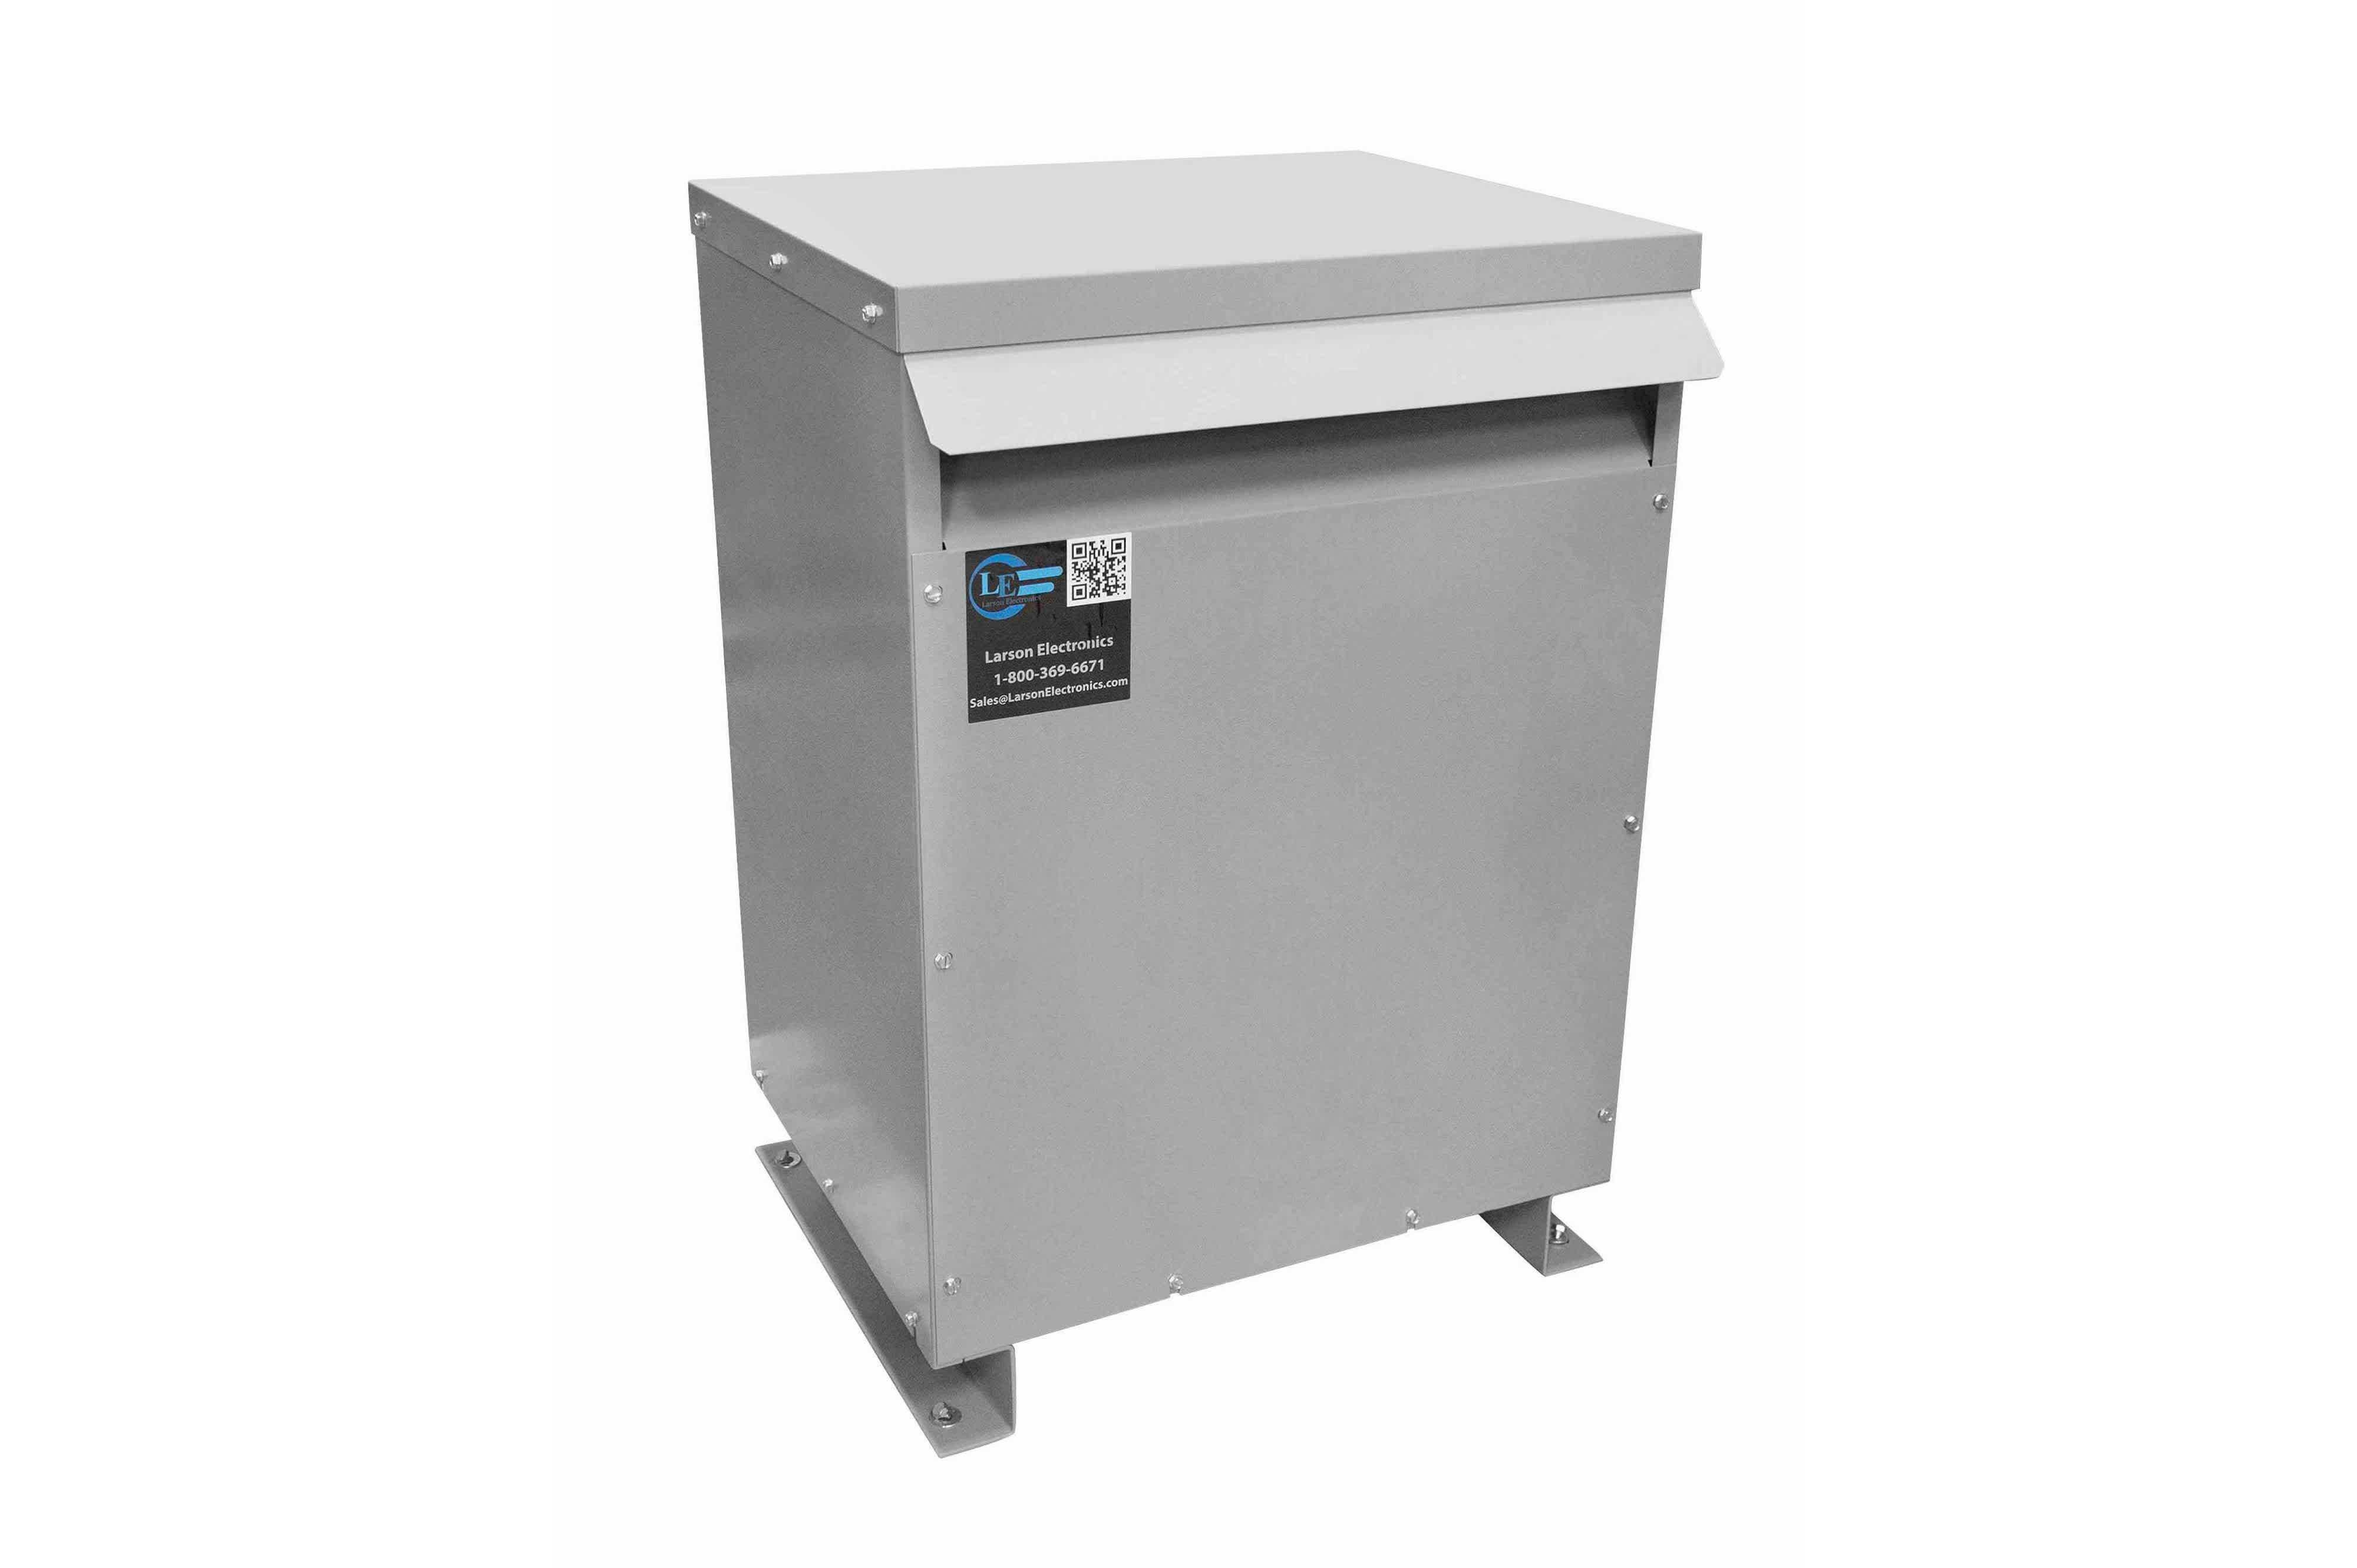 29 kVA 3PH Isolation Transformer, 220V Wye Primary, 480Y/277 Wye-N Secondary, N3R, Ventilated, 60 Hz